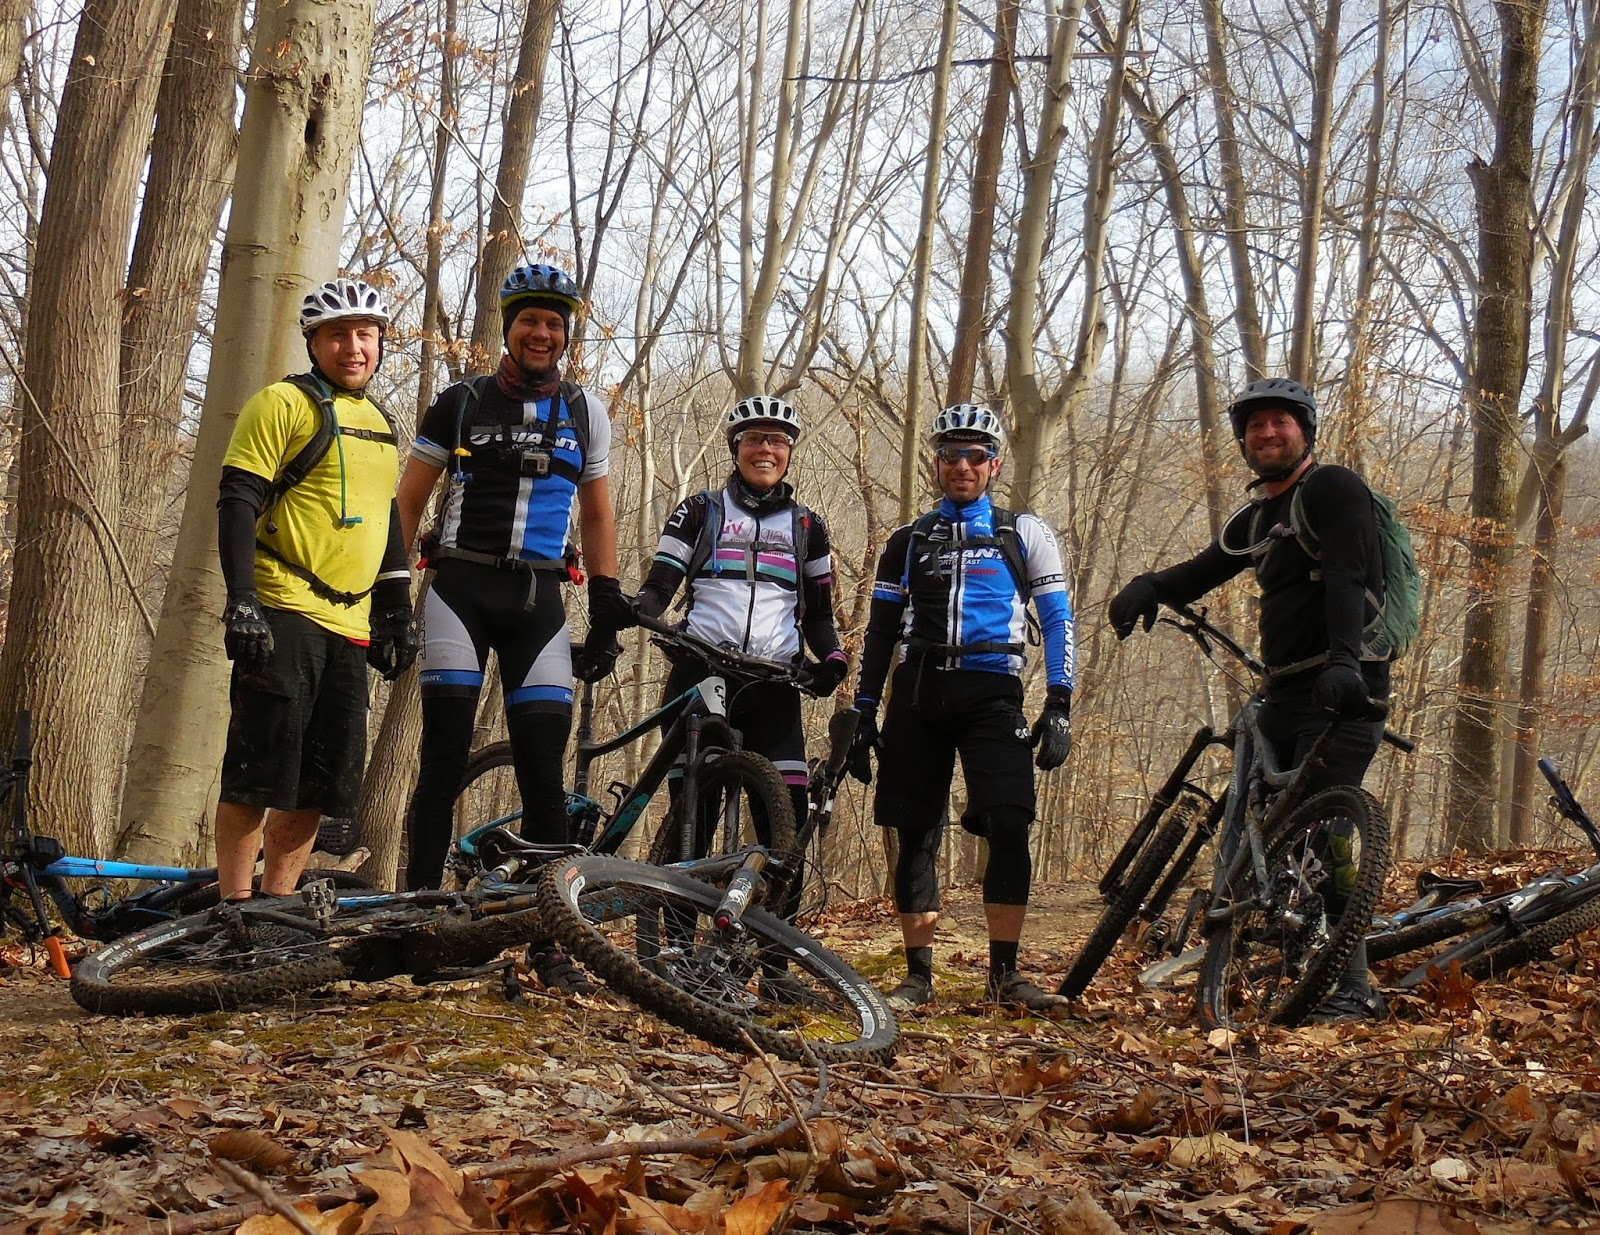 Nankman adventures in cycling susquehanna state park md for Susquehanna state park cabins